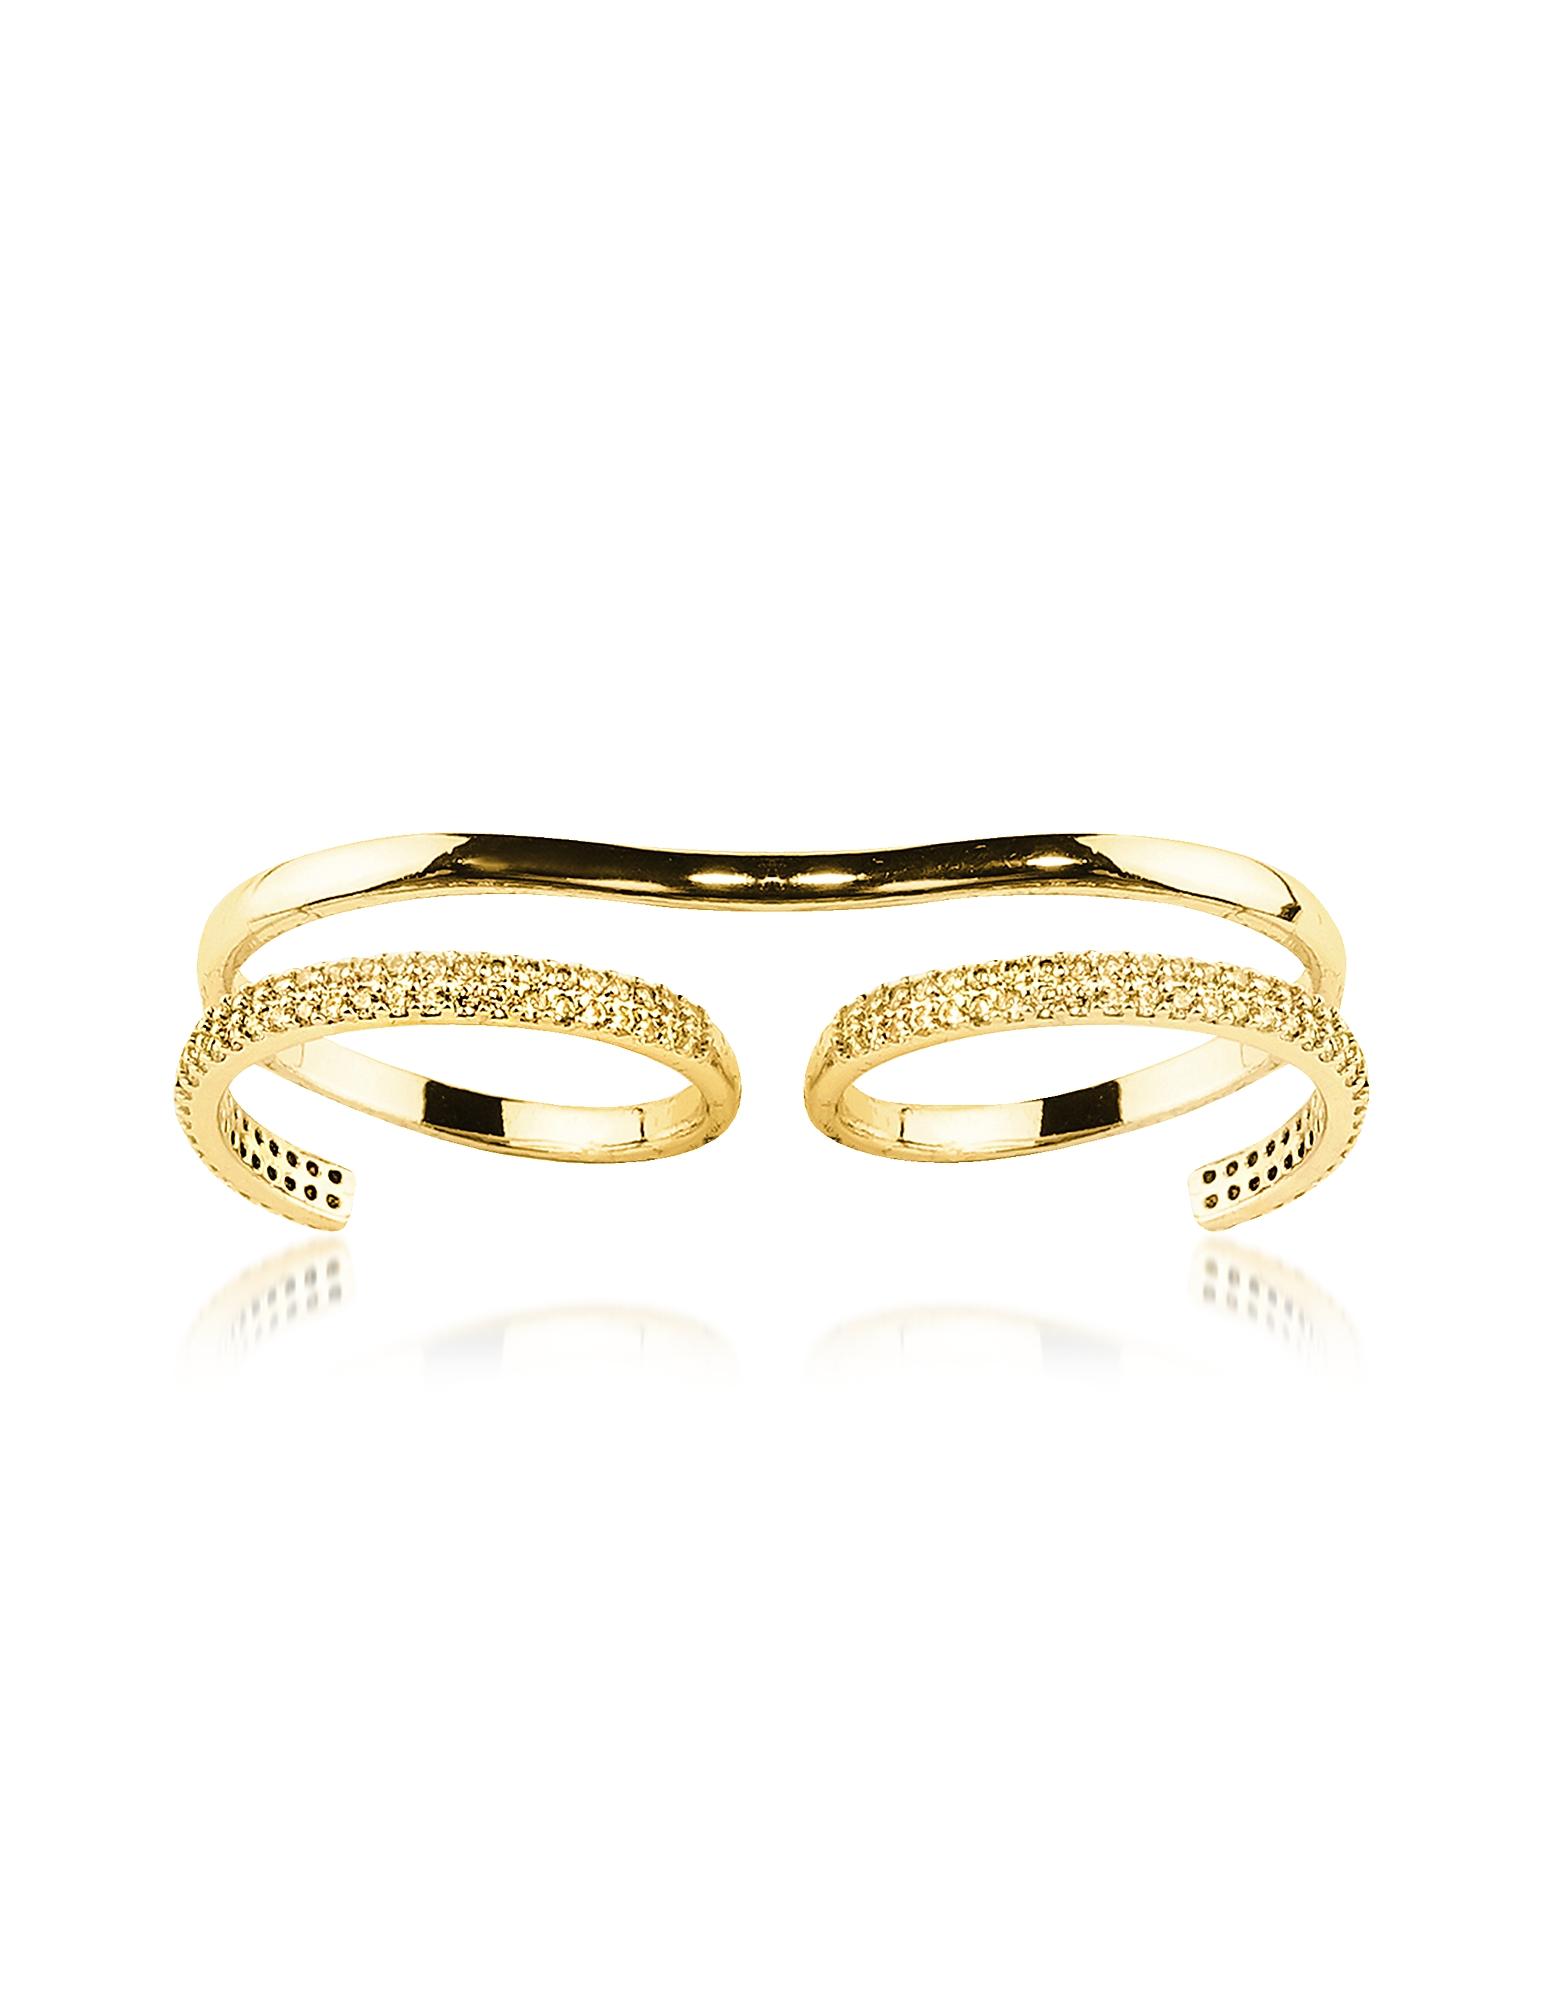 Federica Tosi Rings, Double Full Ring